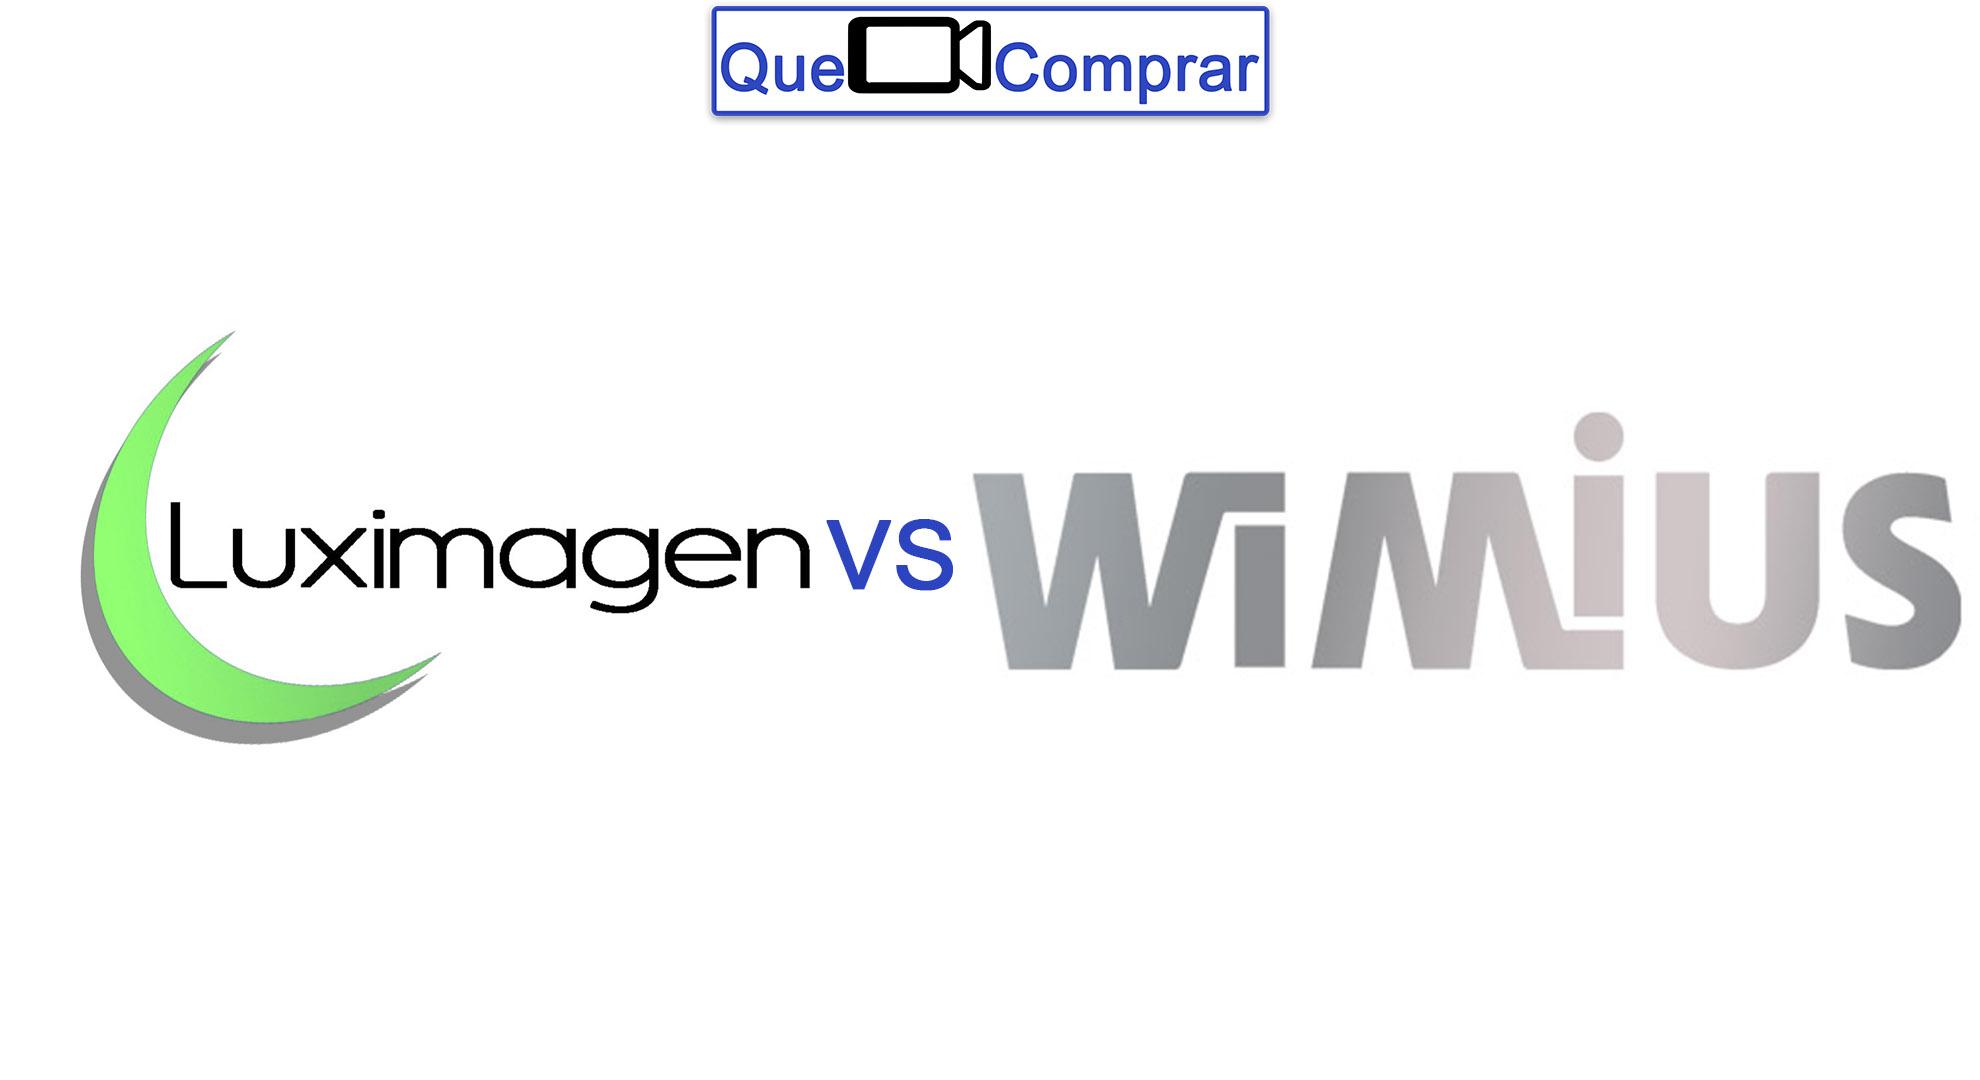 Luximagen vs Wimius